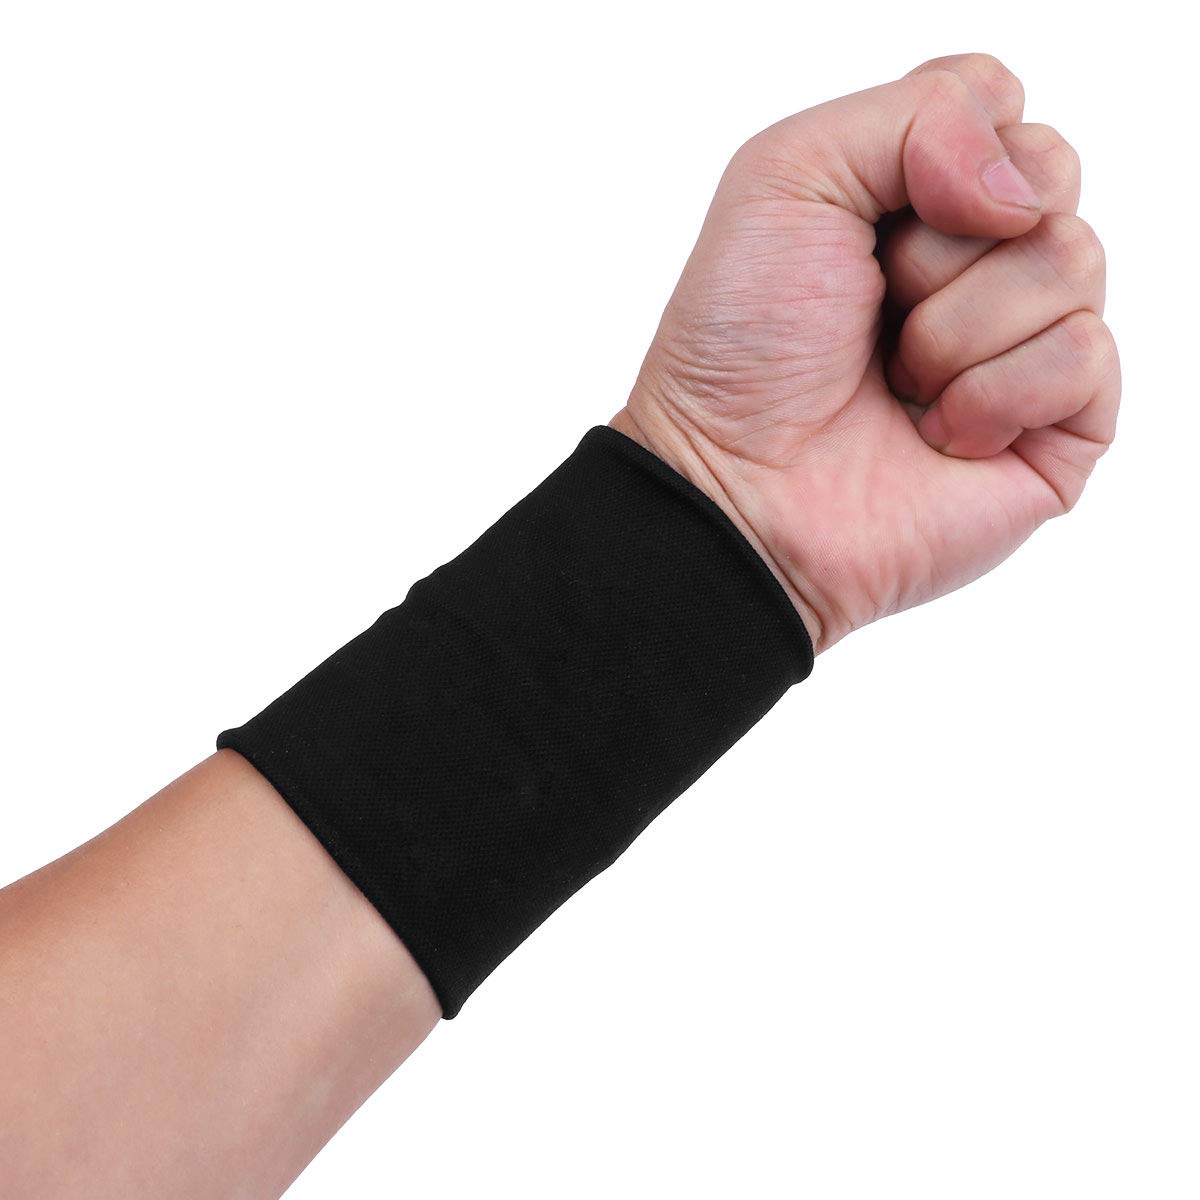 IEFIEL 1 Pair Compression Wrist Sleeves Tattoo Cover Brace for Arthritis Carpal Tendinitis Black M